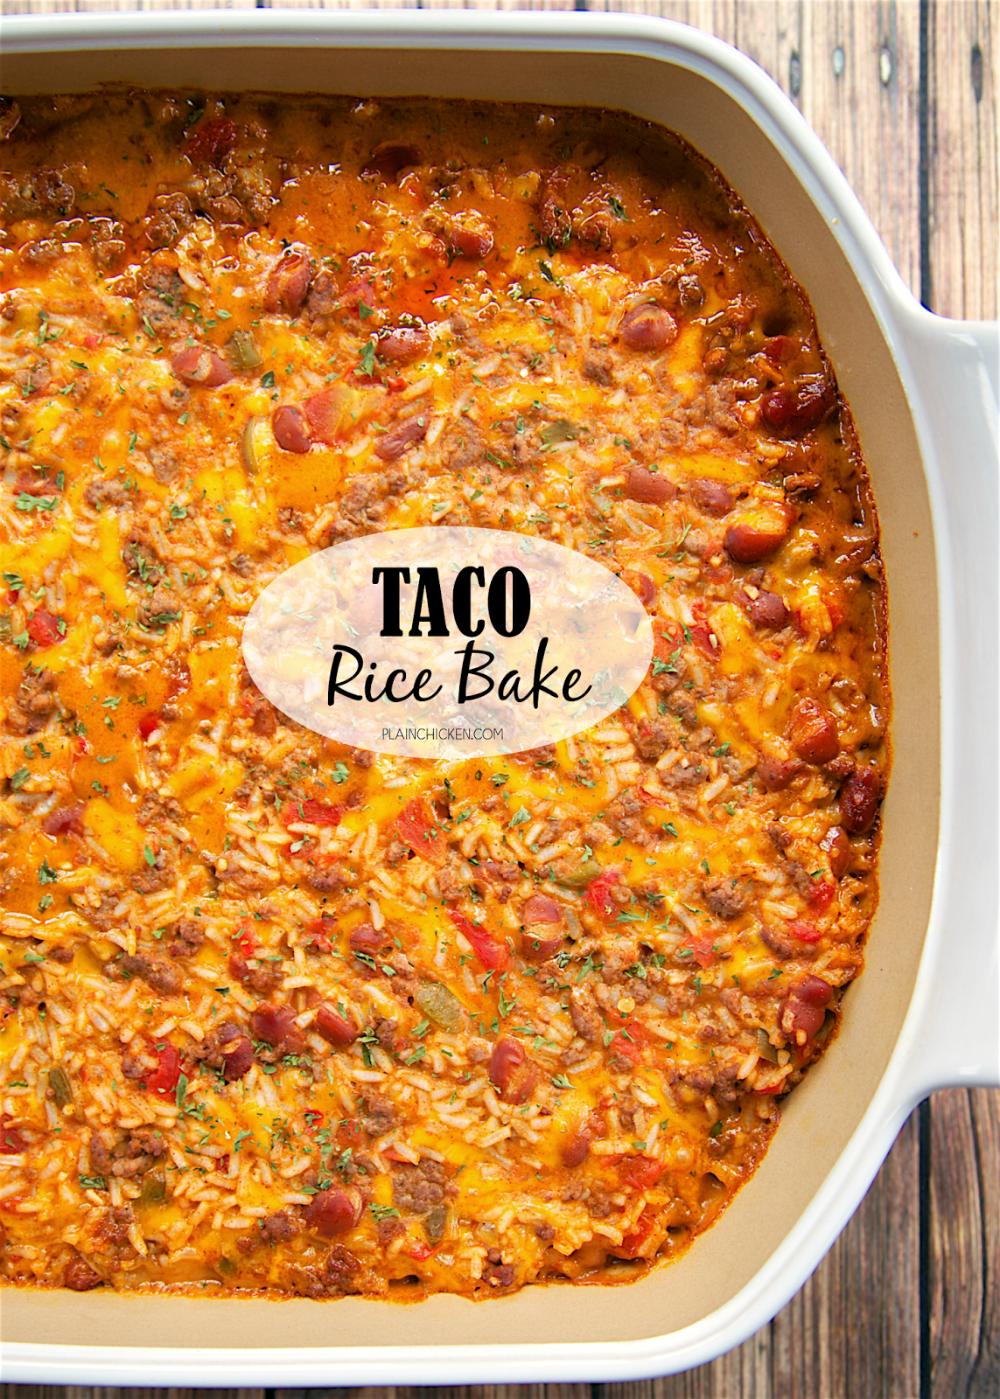 Photo of Taco Rice Bake